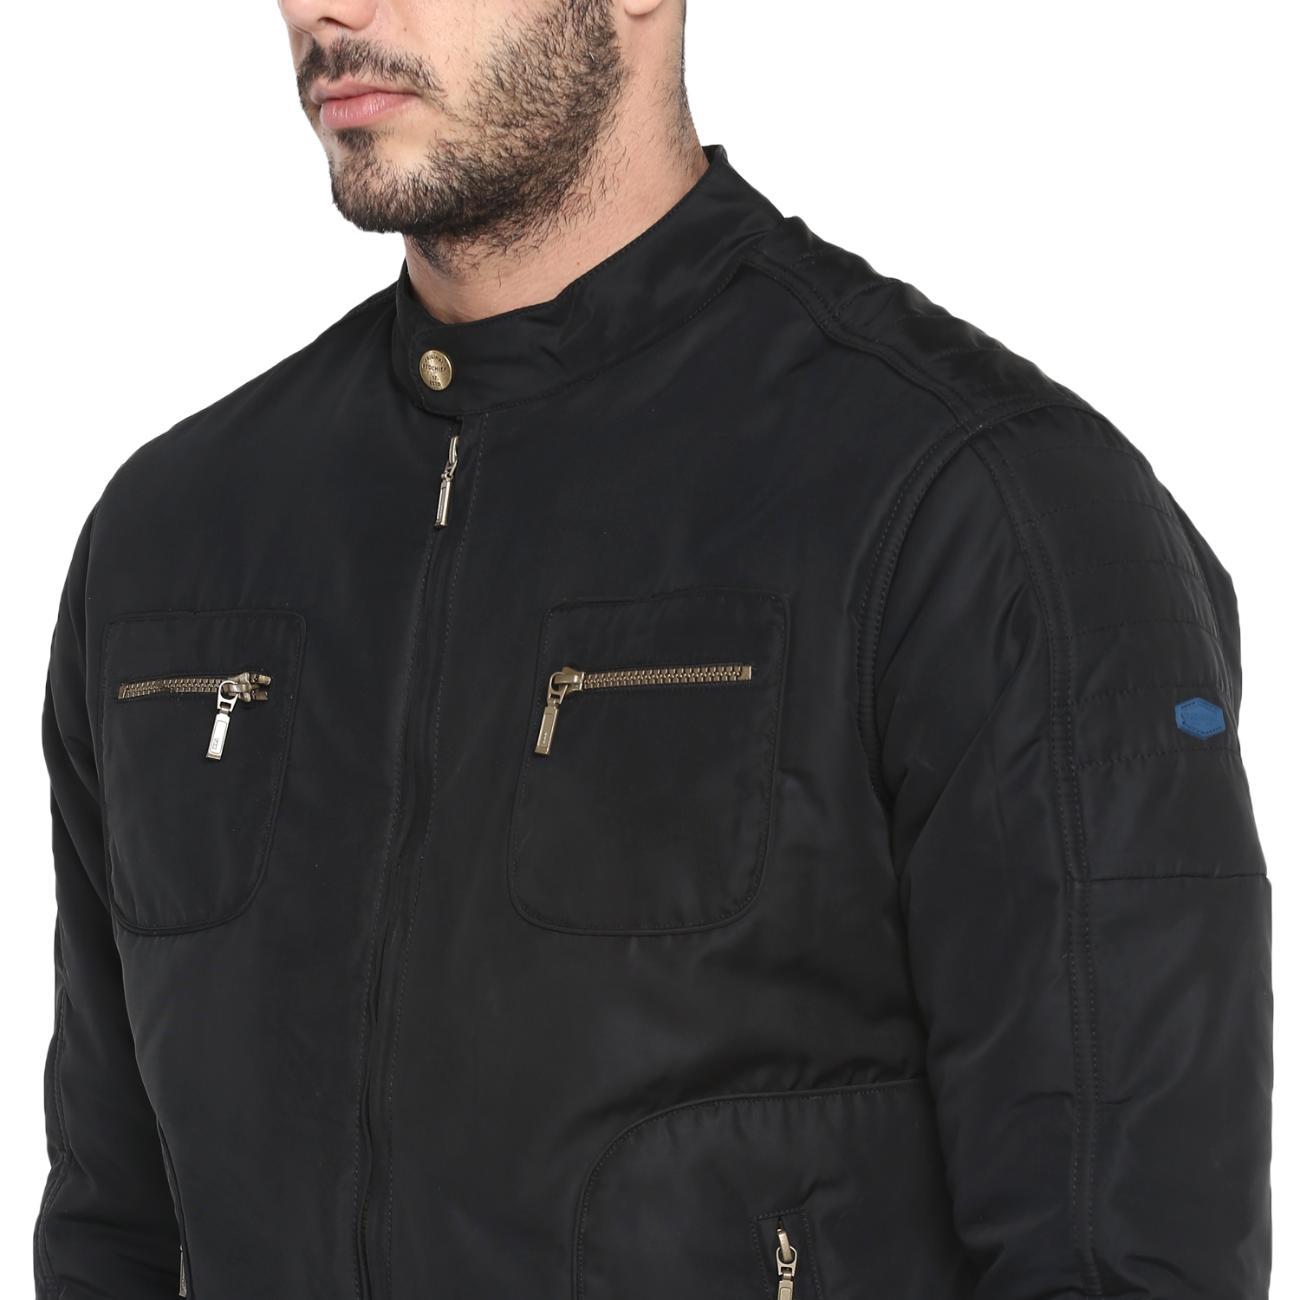 Purchase Black Jacket Online